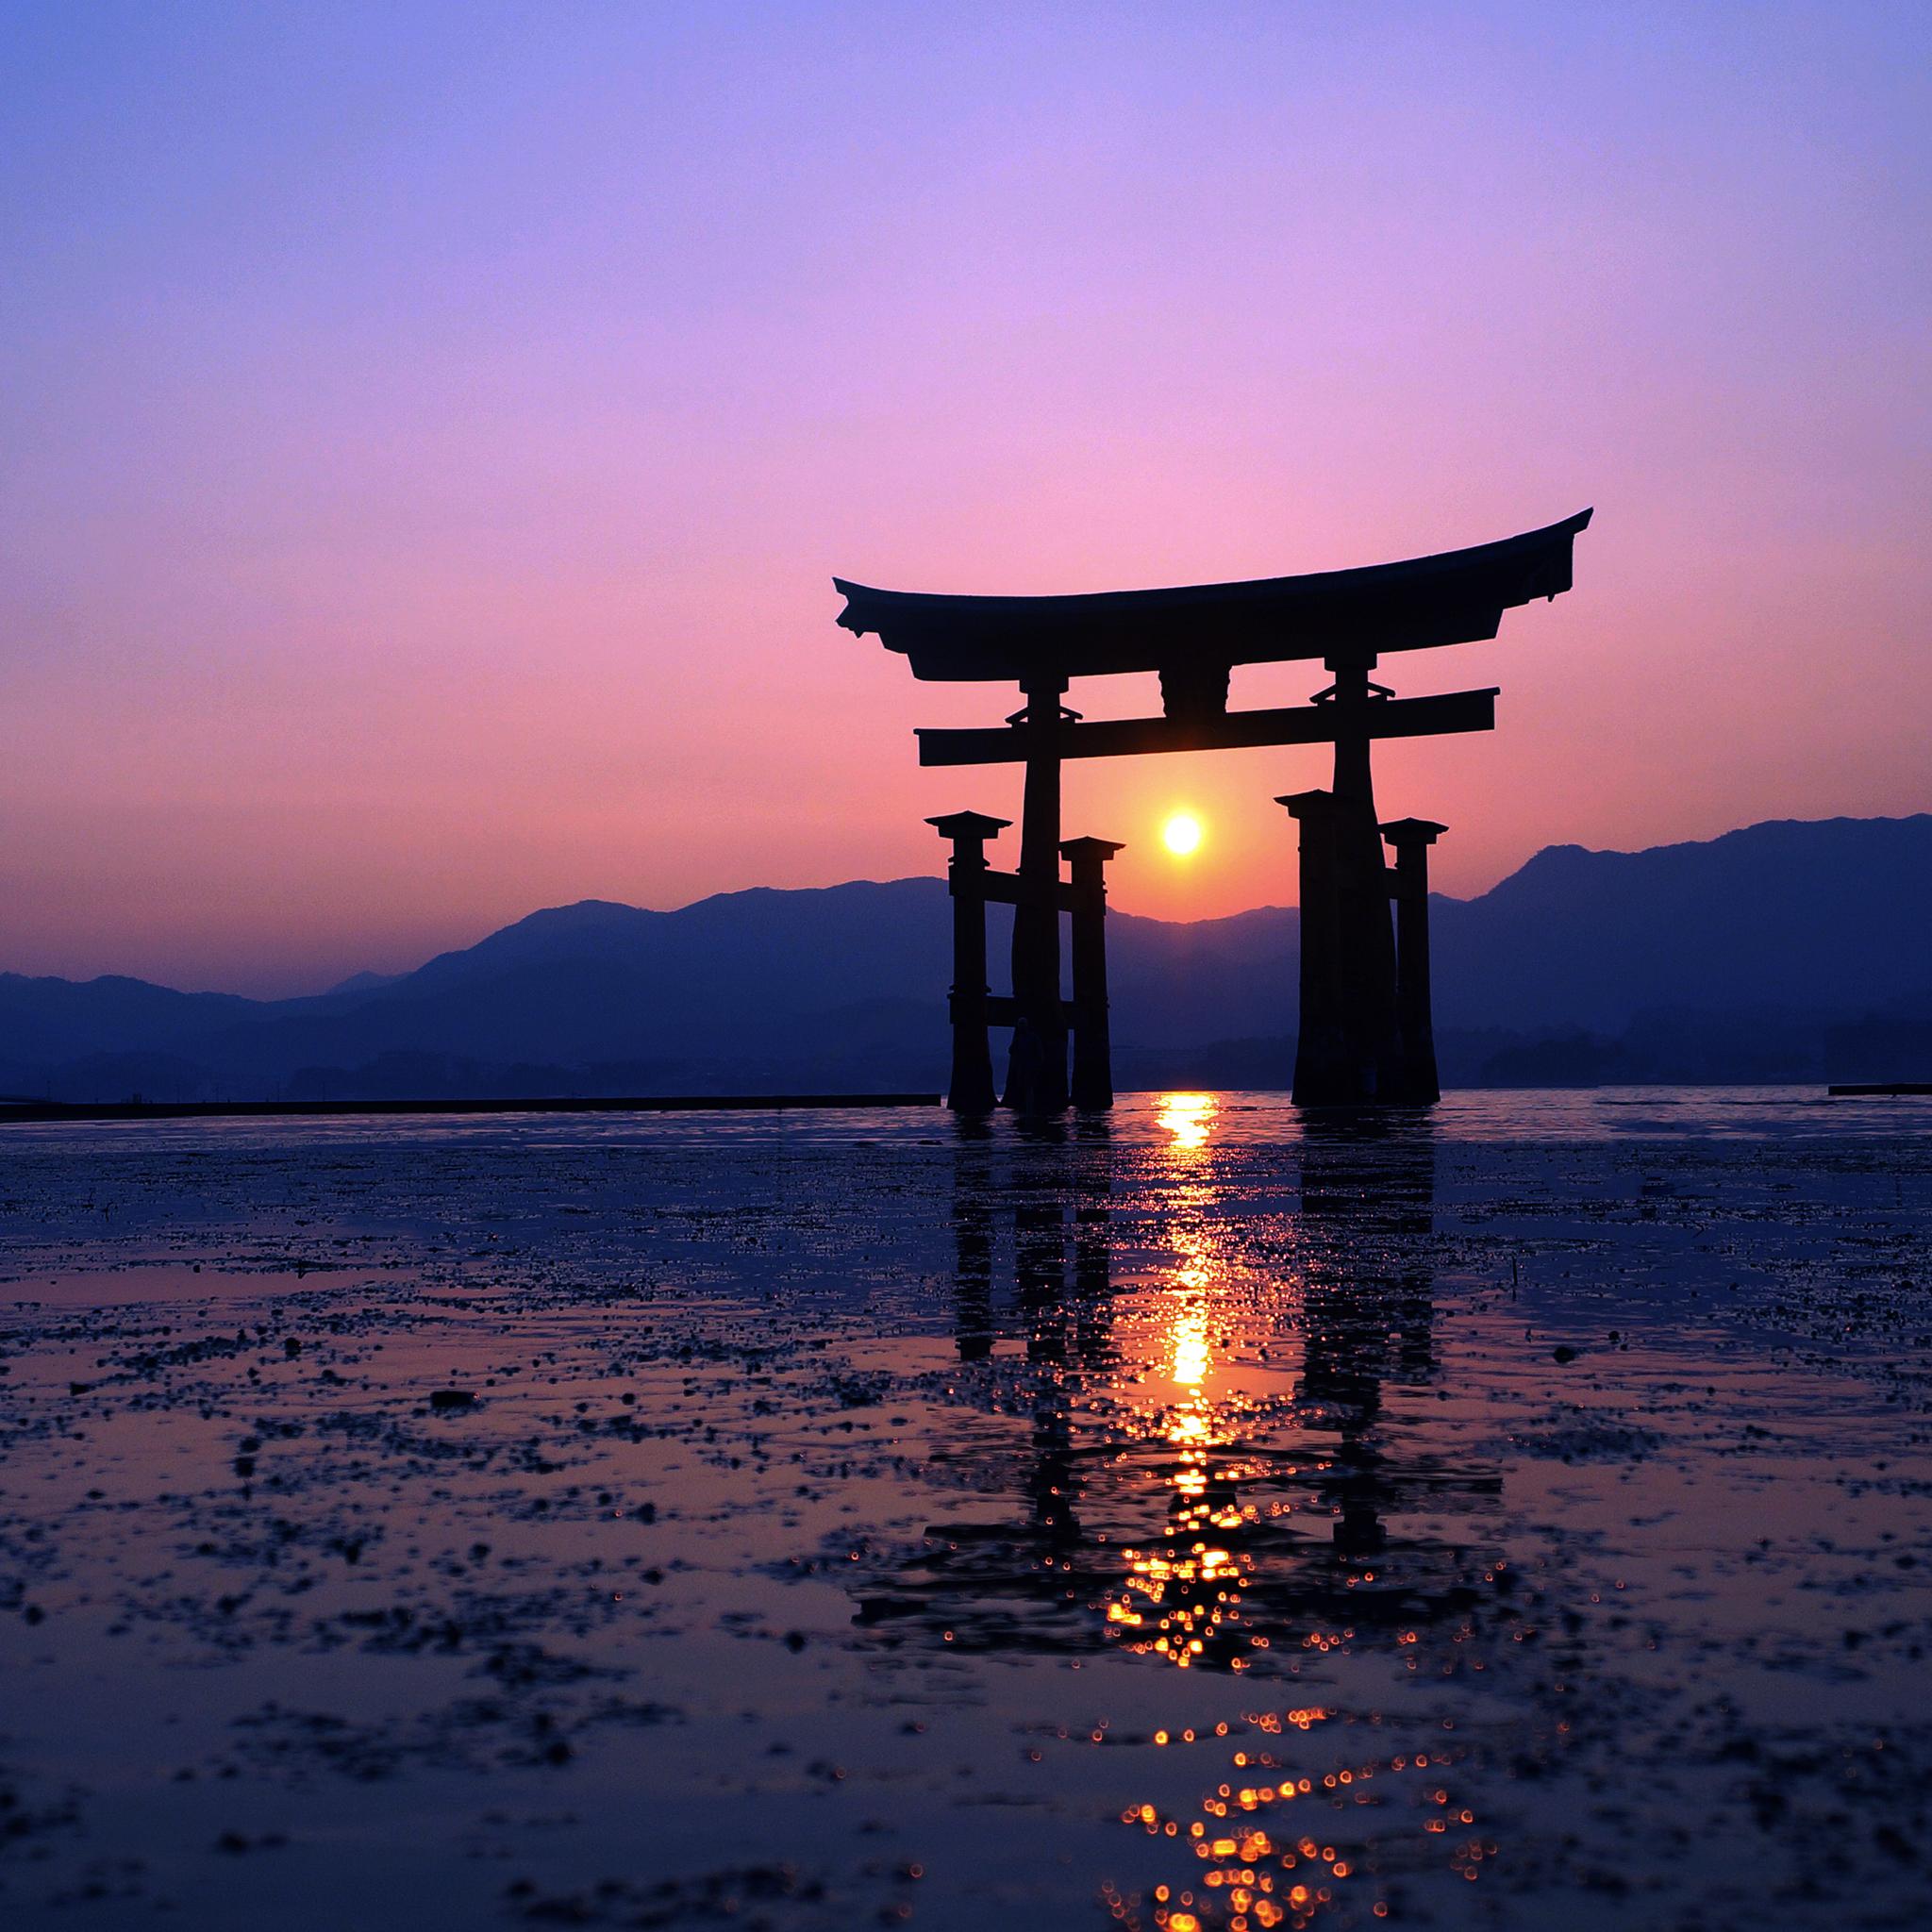 japan-sunset-purple-evening-4k-5m.jpg